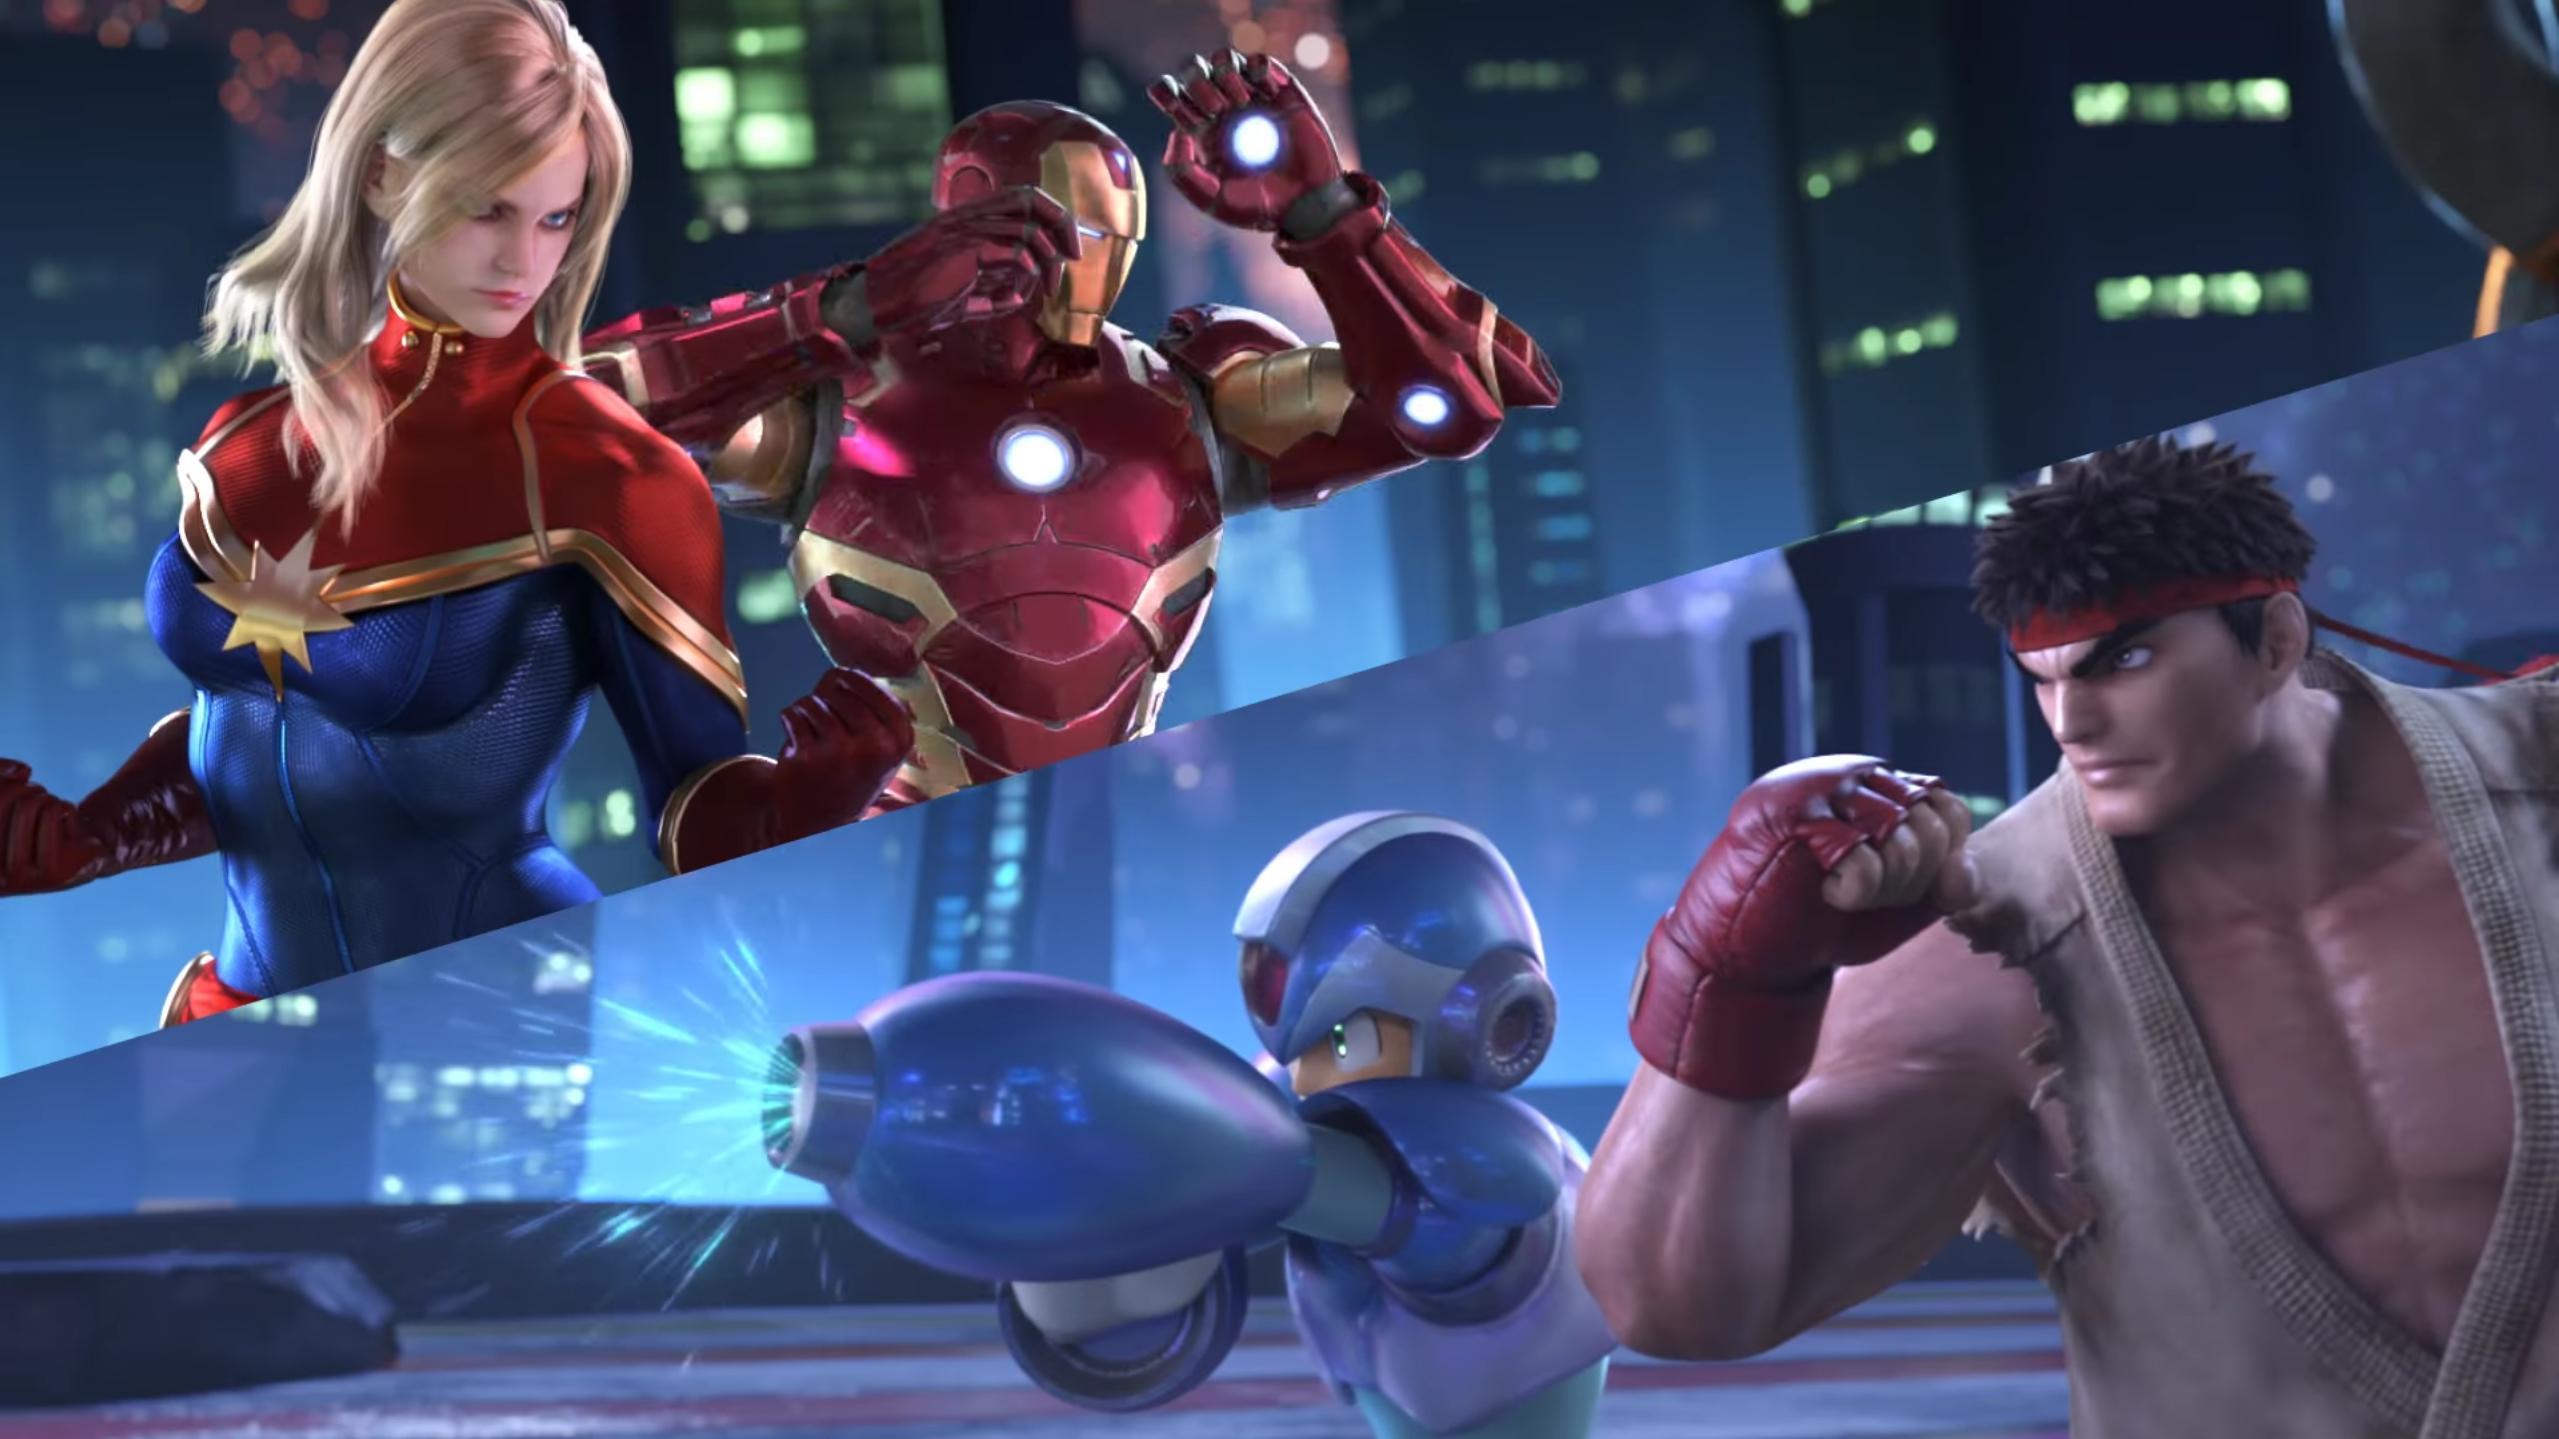 Marvel vs Capcom: Infinite revealed, coming to PC next year